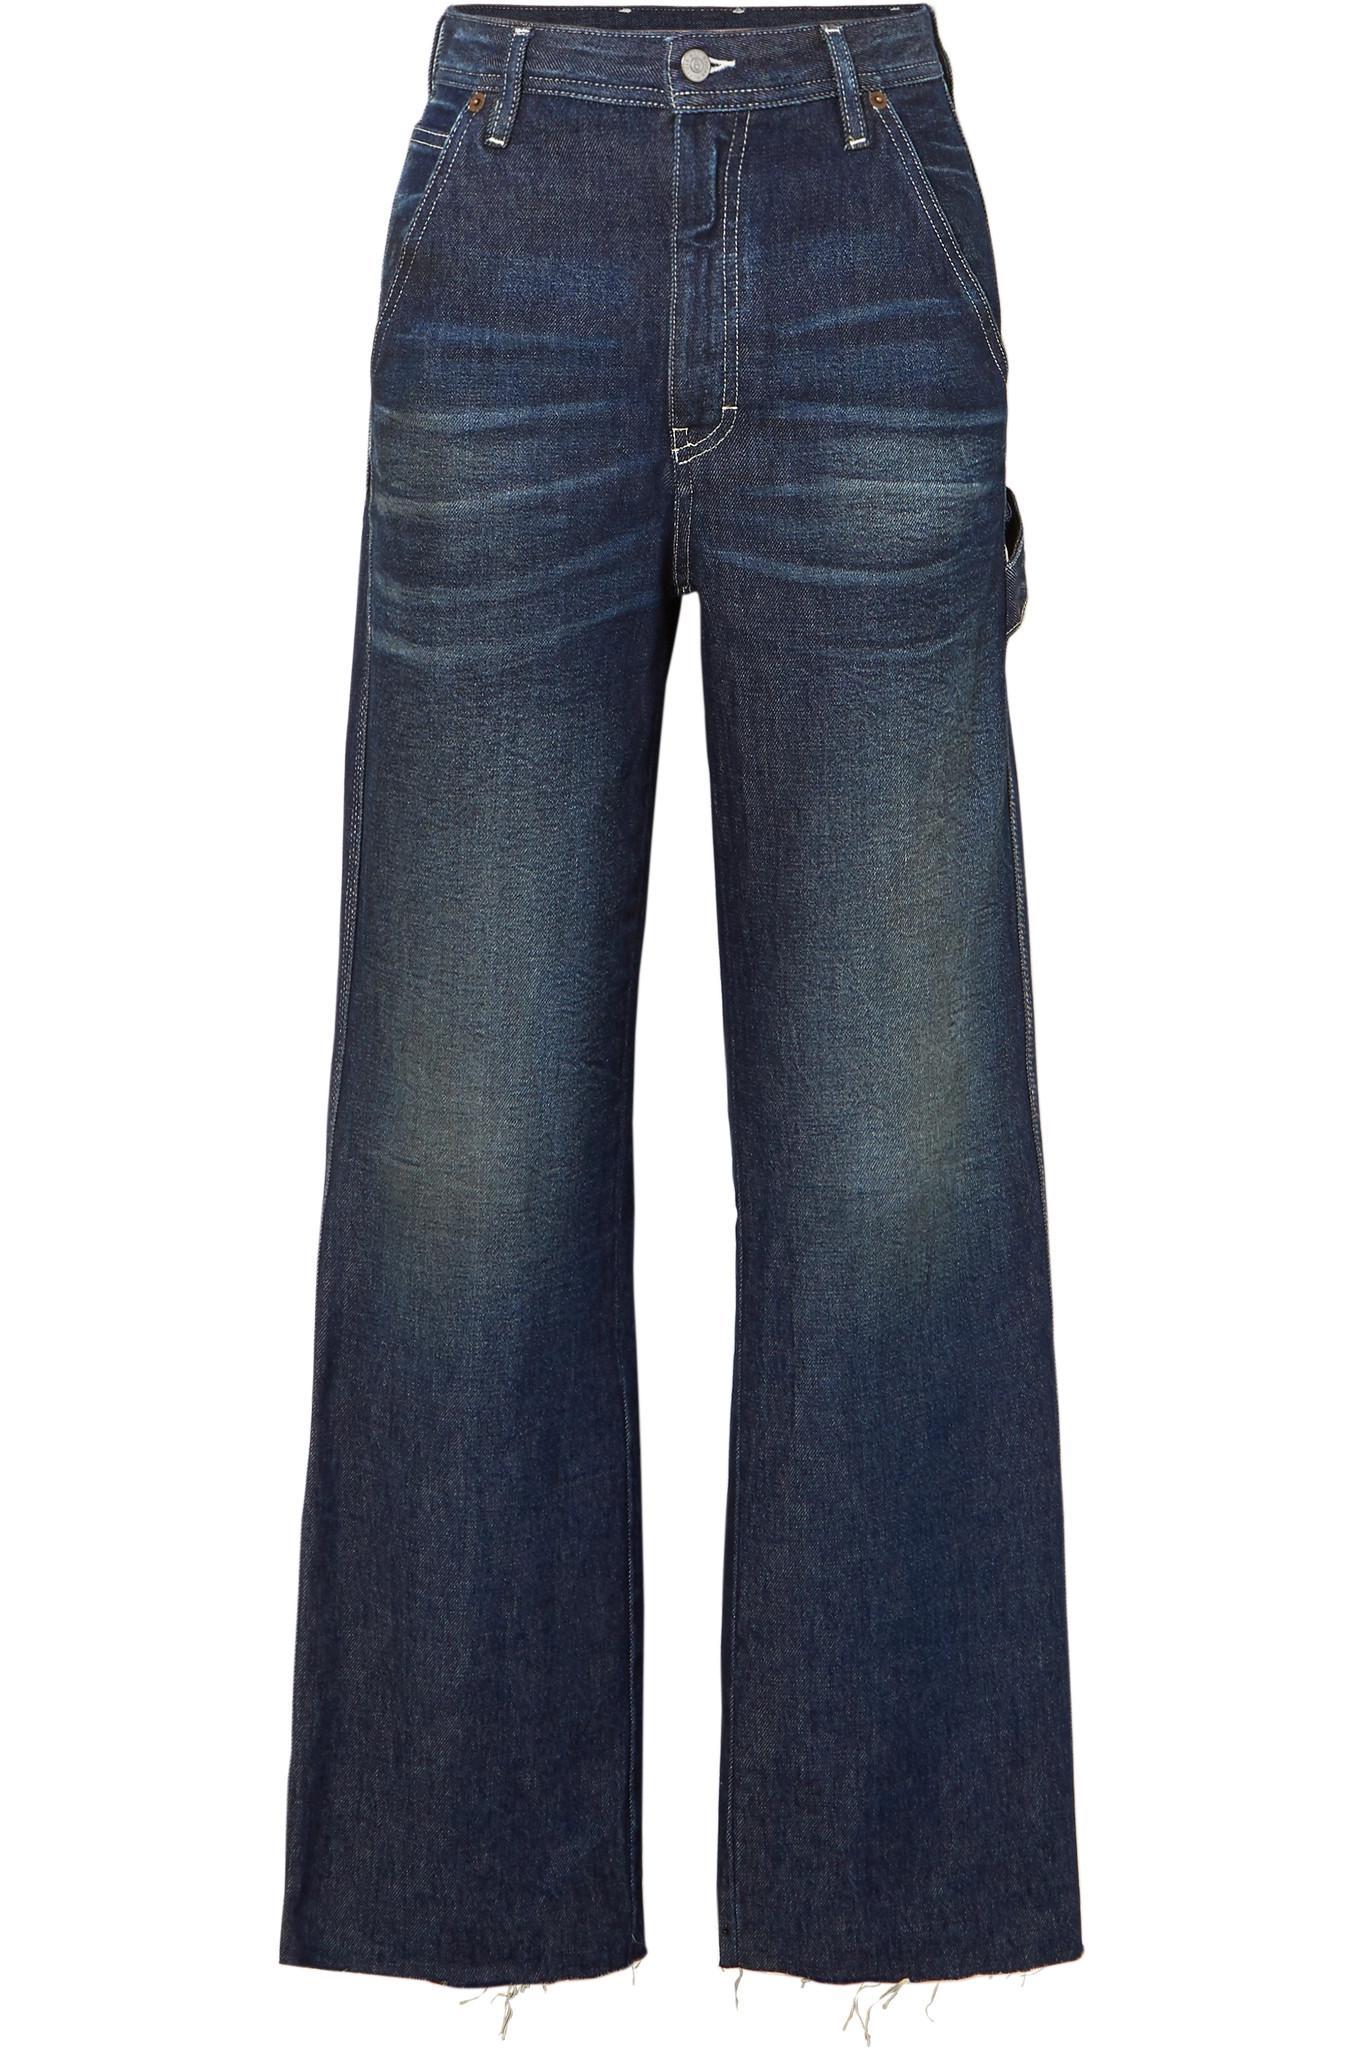 Quality Frayed High-rise Wide-leg Jeans - Dark denim Maison Martin Margiela Great Deals Cheap Online Clearance Choice uLZDcf7